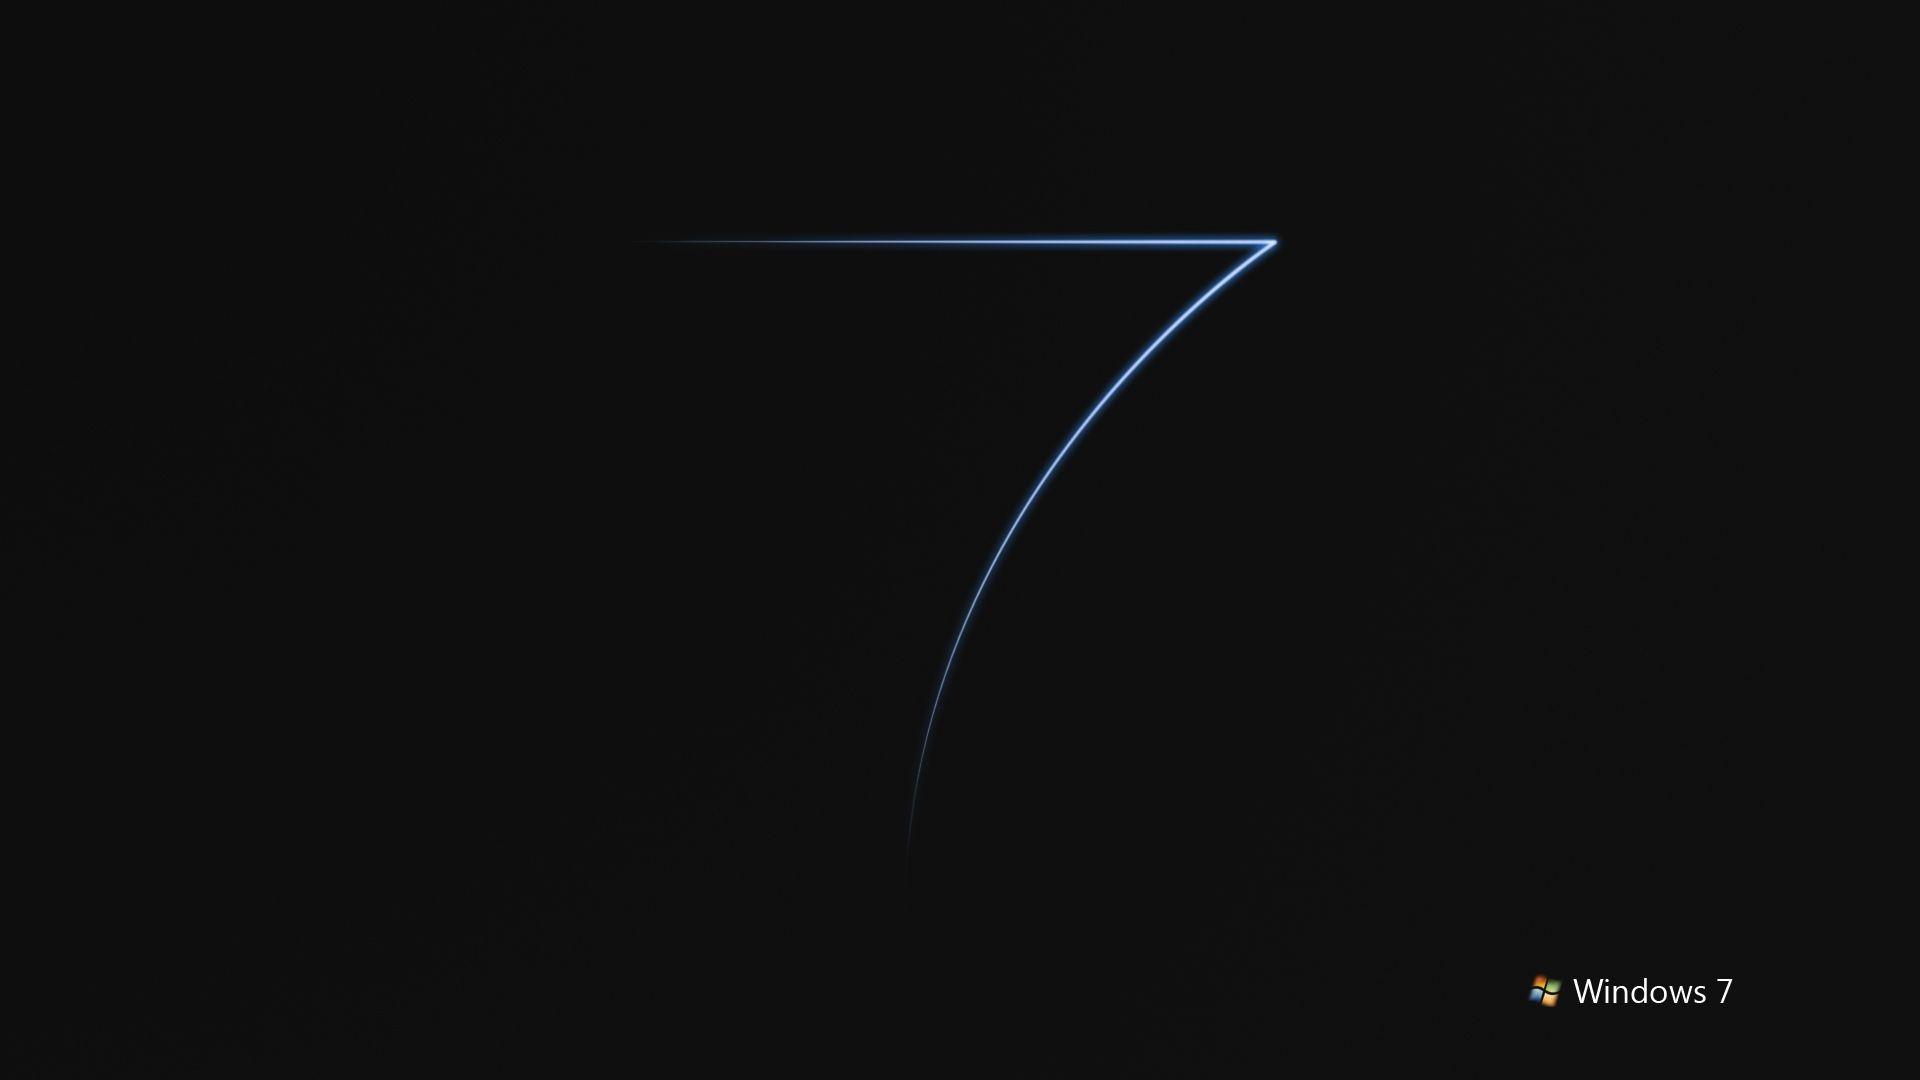 Windows 7 Black Wallpaper 71 Images